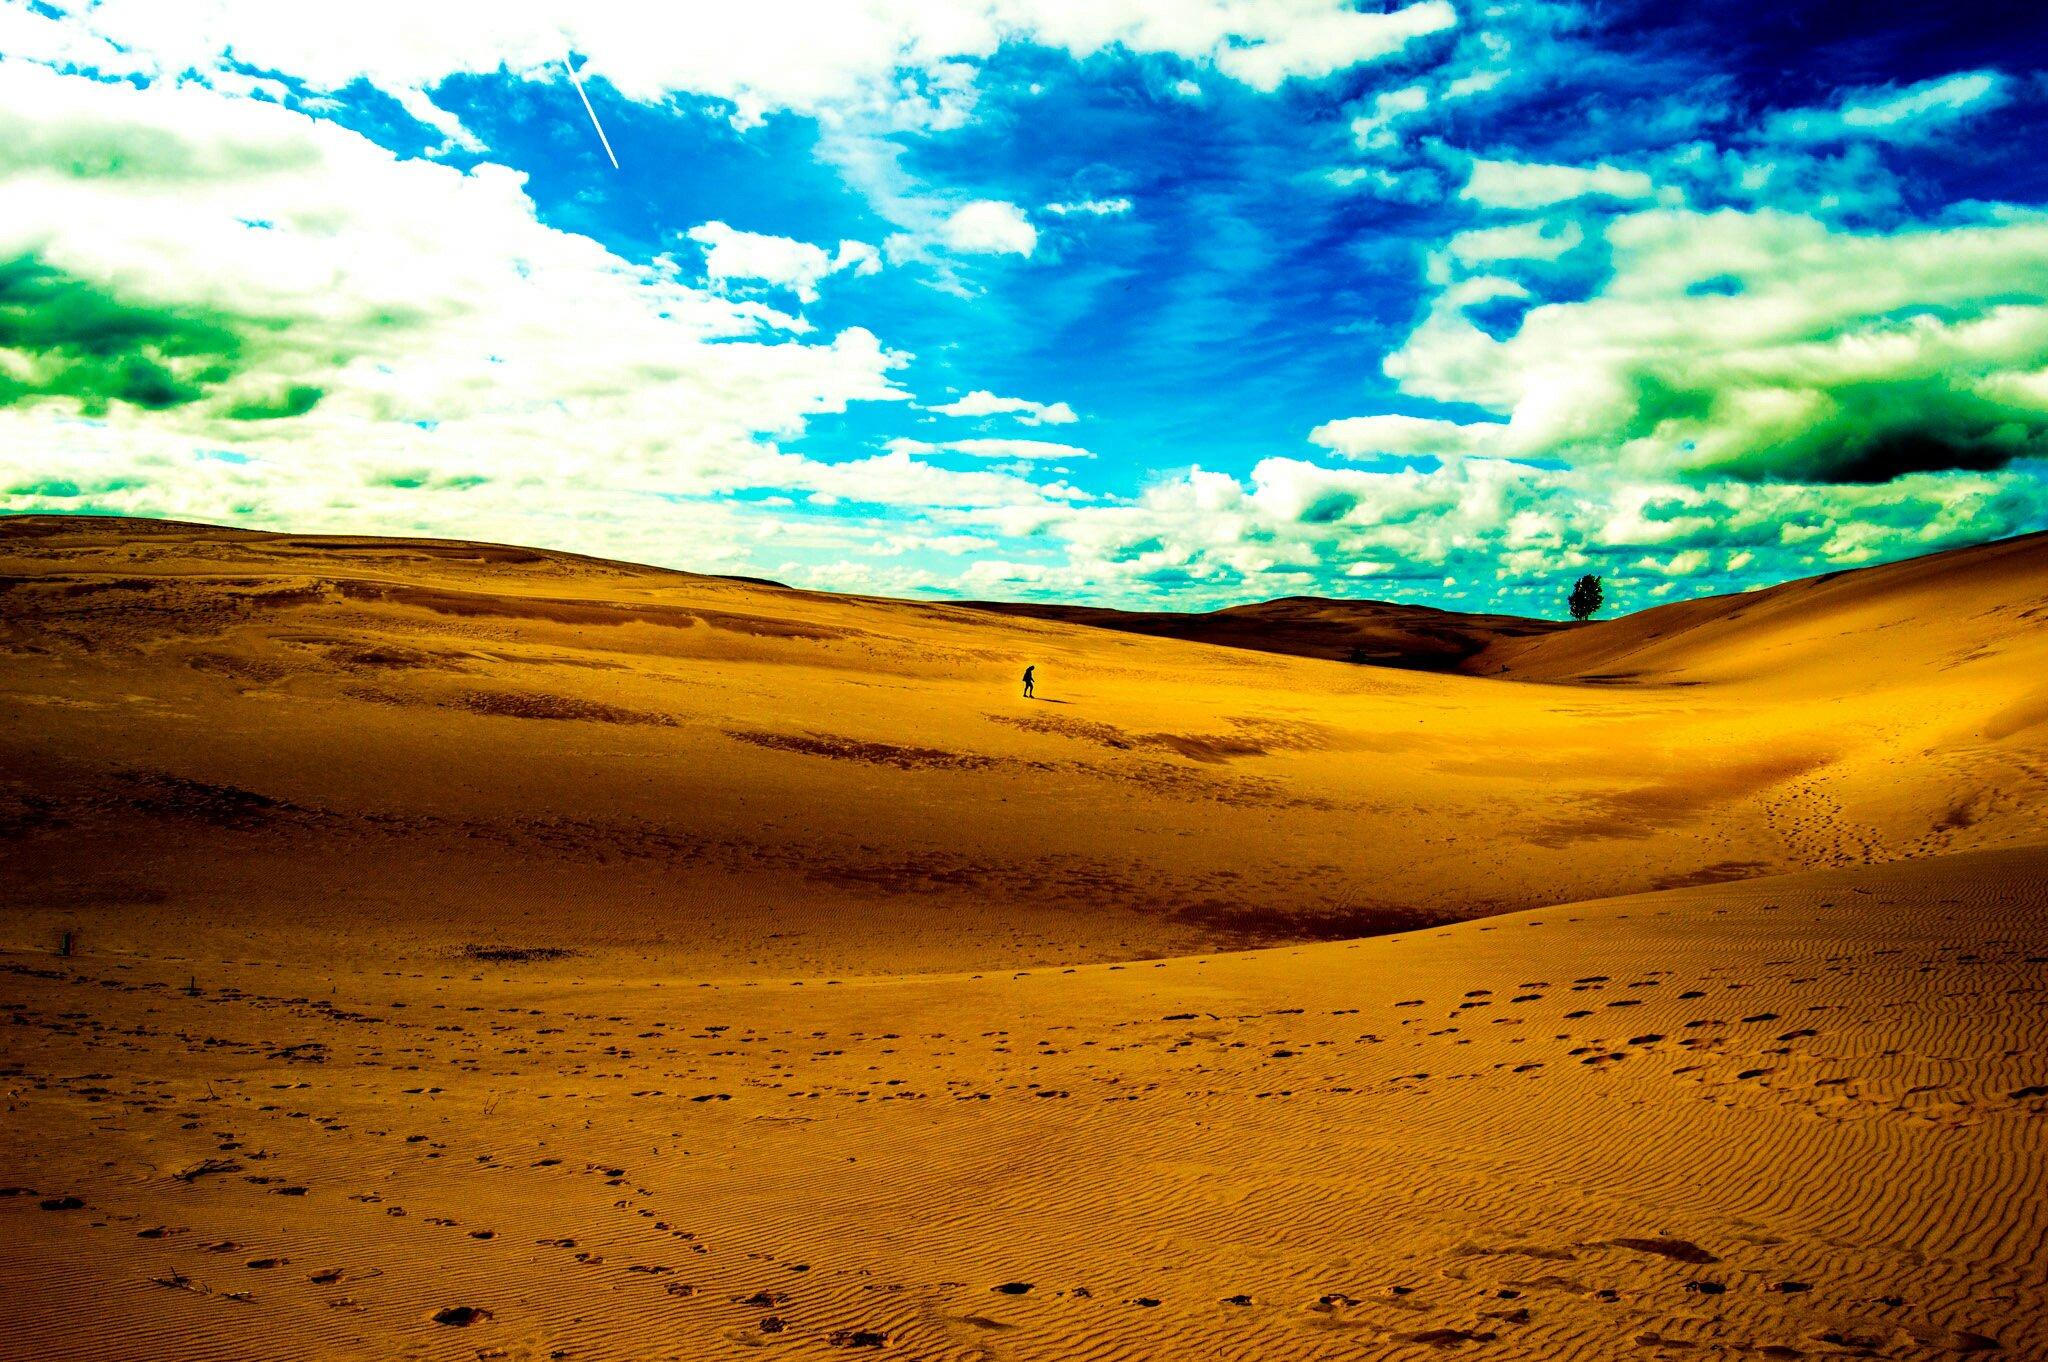 1920x1080 hd wallpaper dune - photo #14